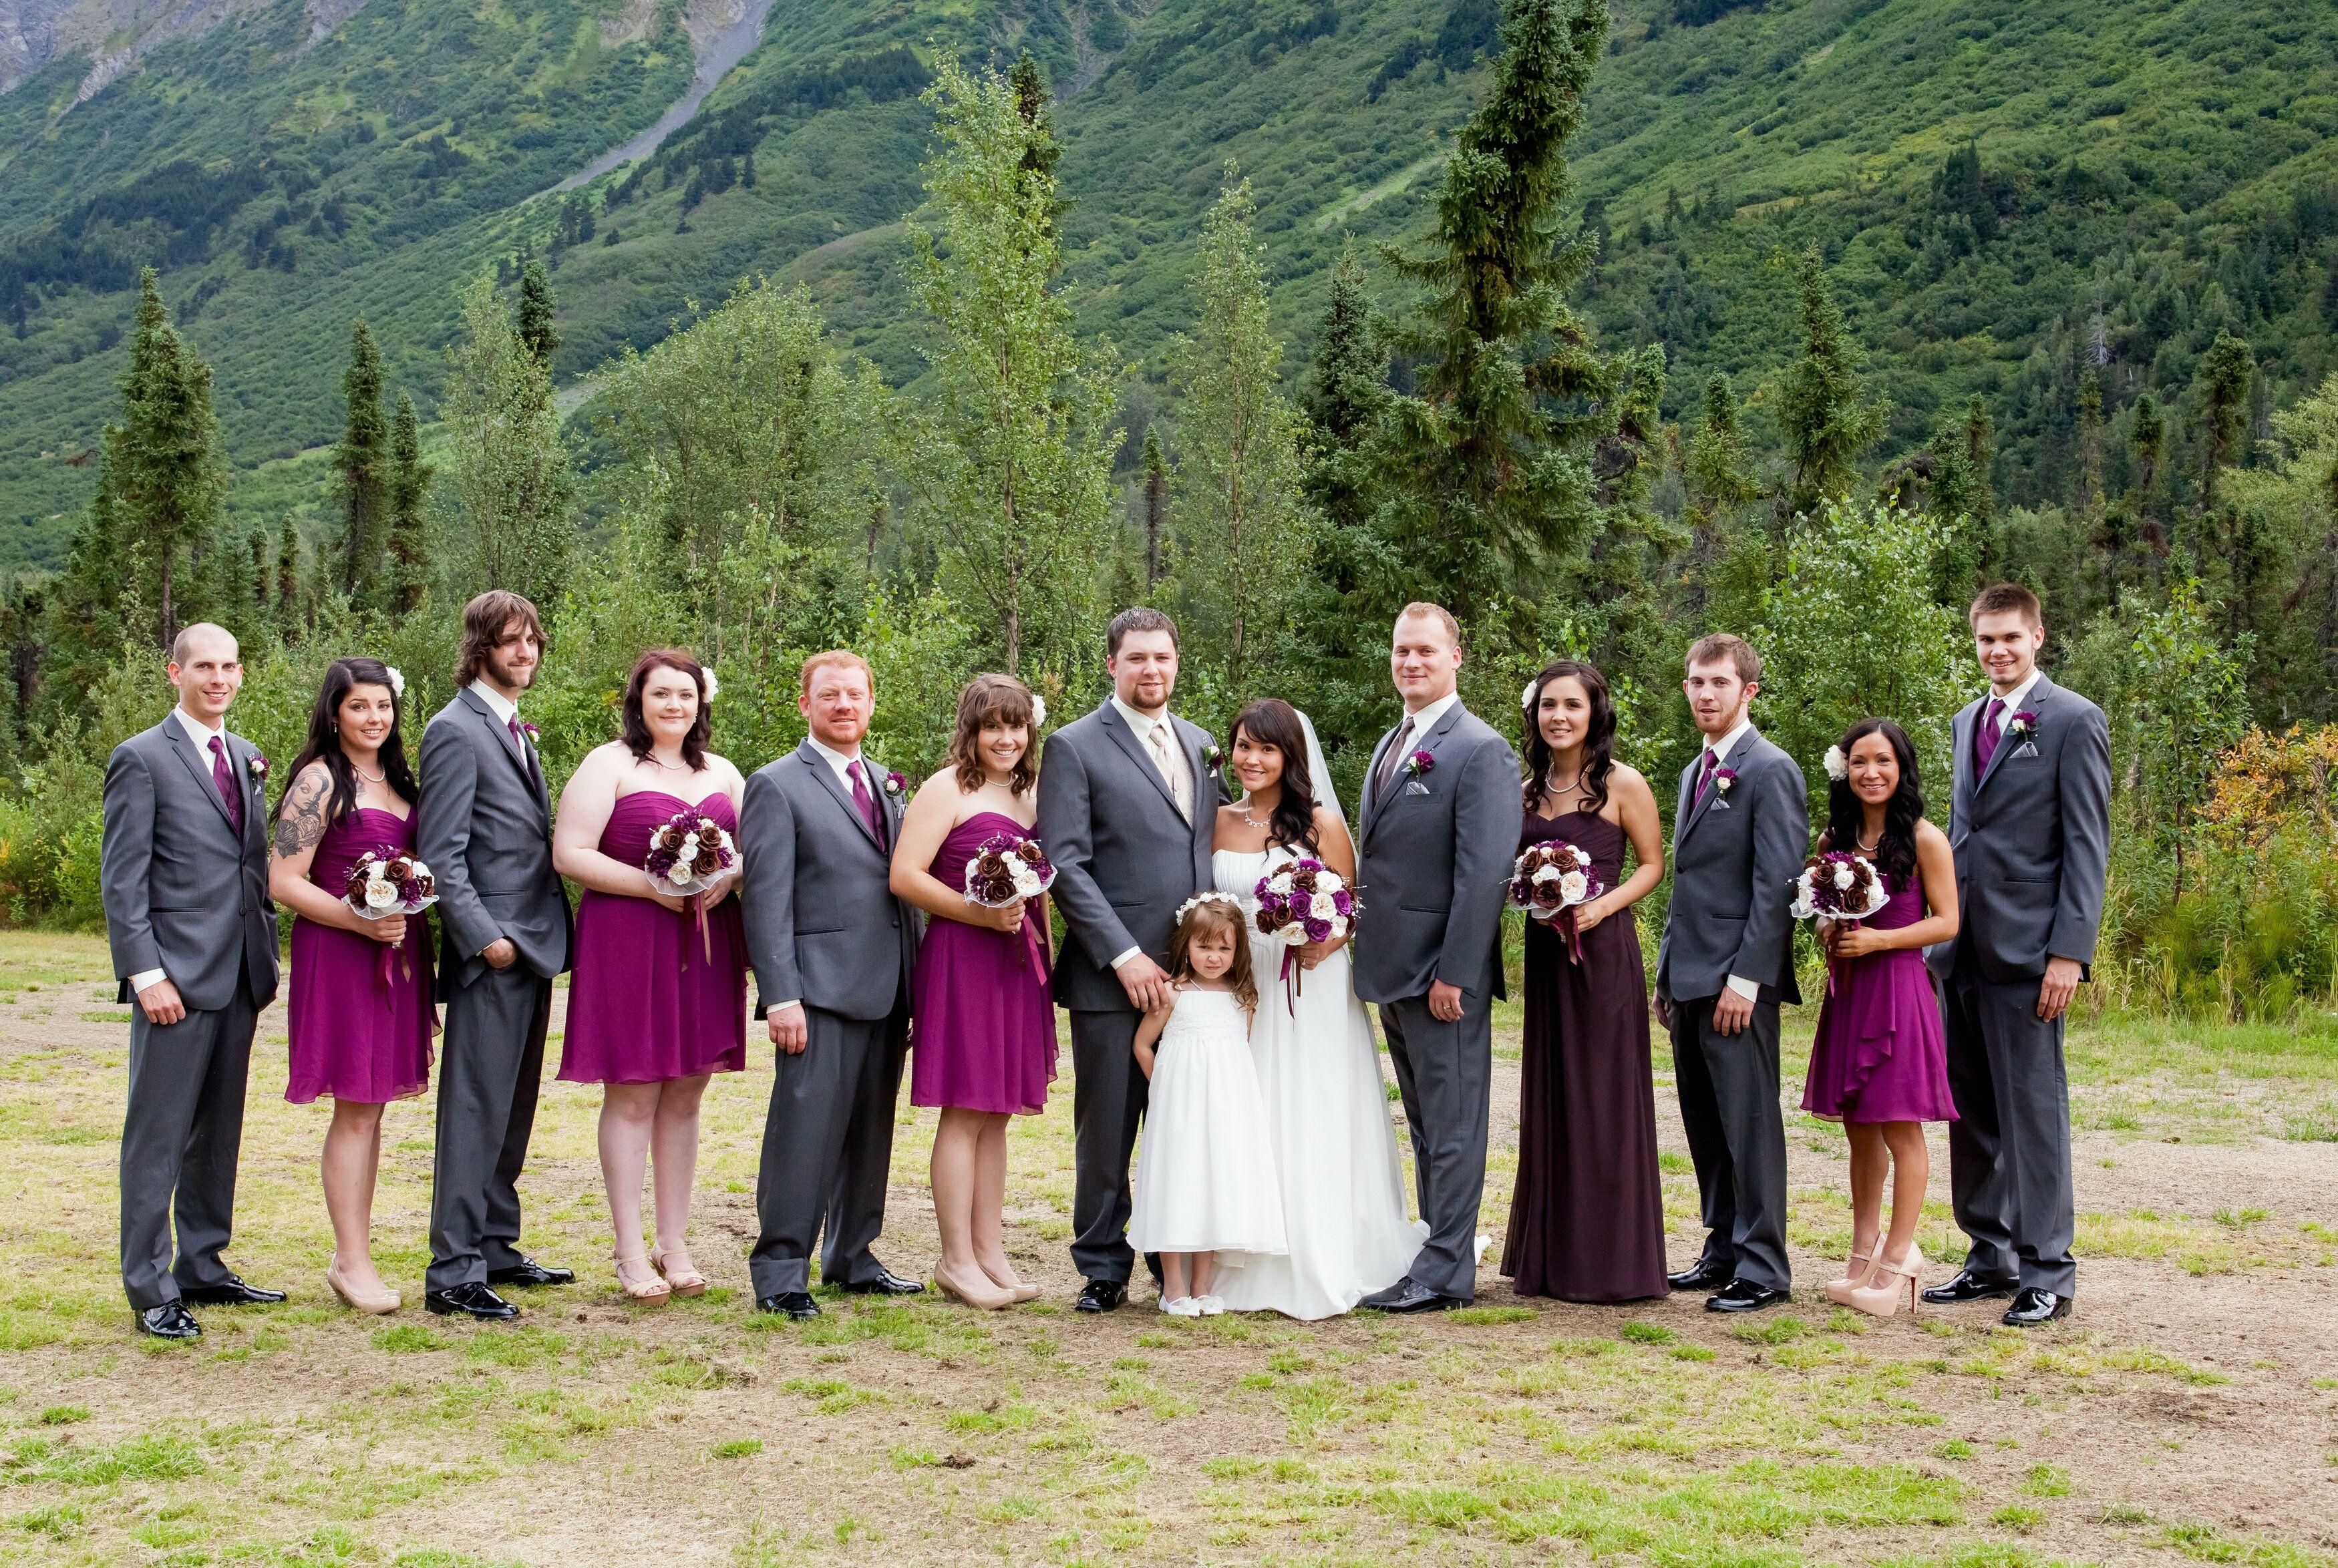 lilac bridesmaid and groom - HD3500×2348